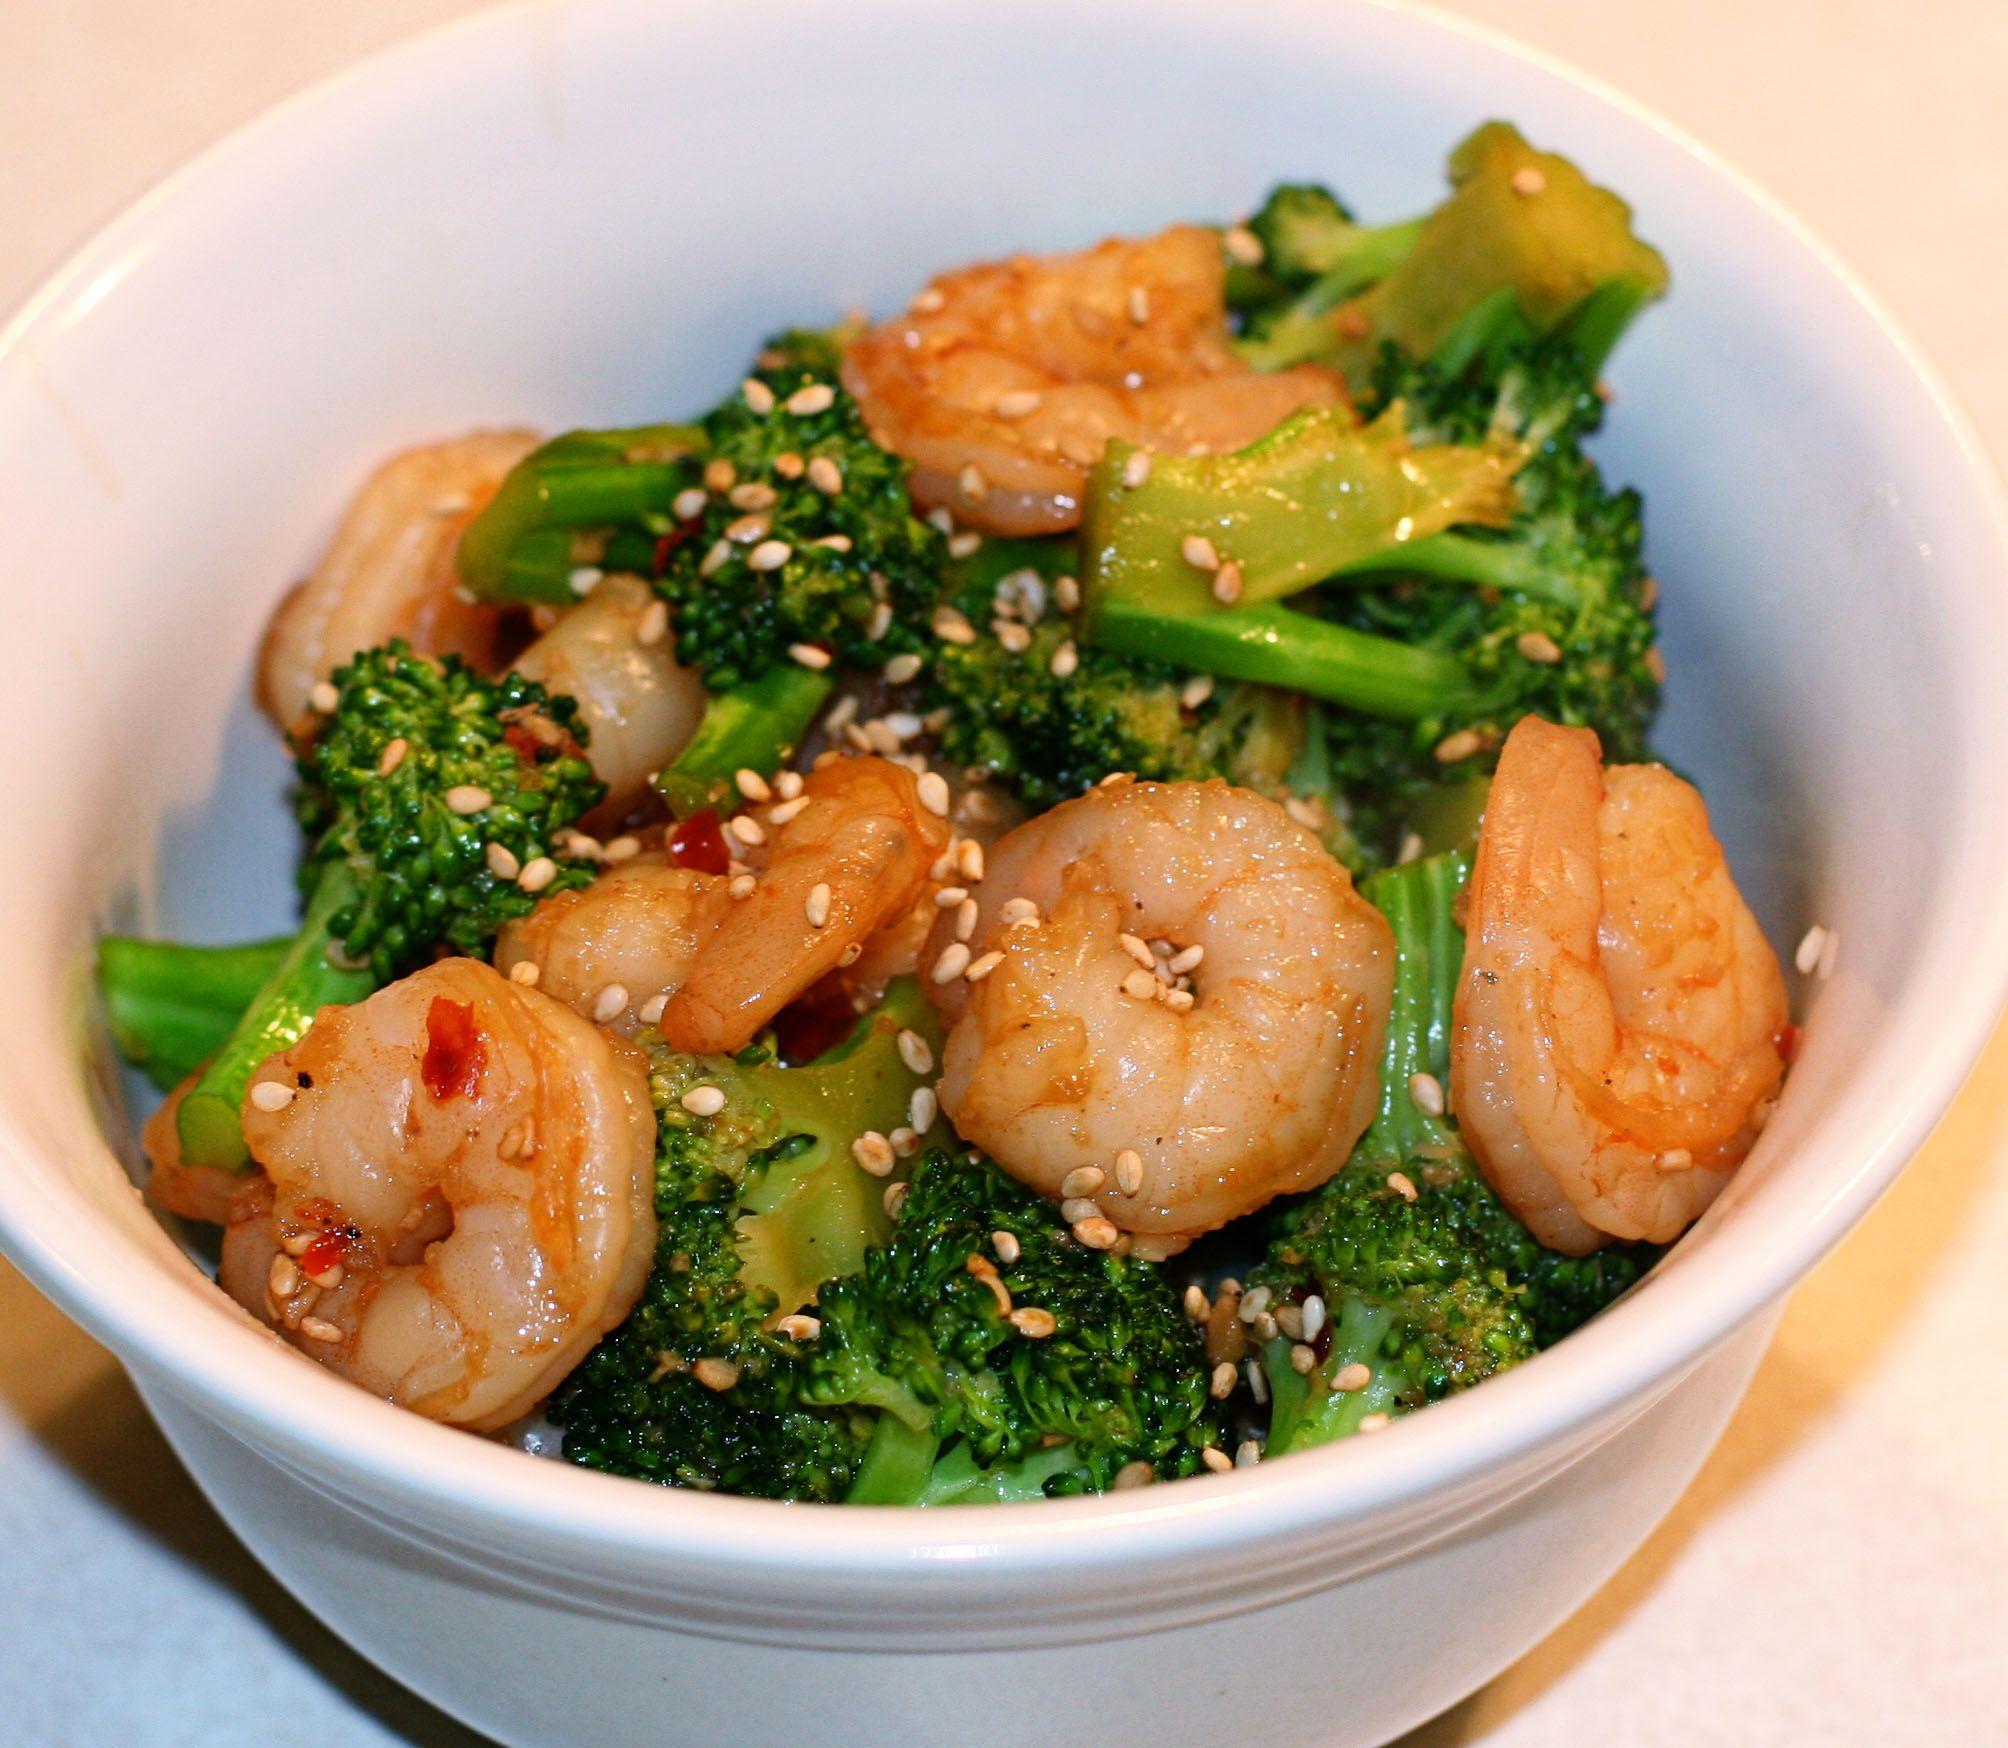 sesame shrimp and broccoli...quick and easy